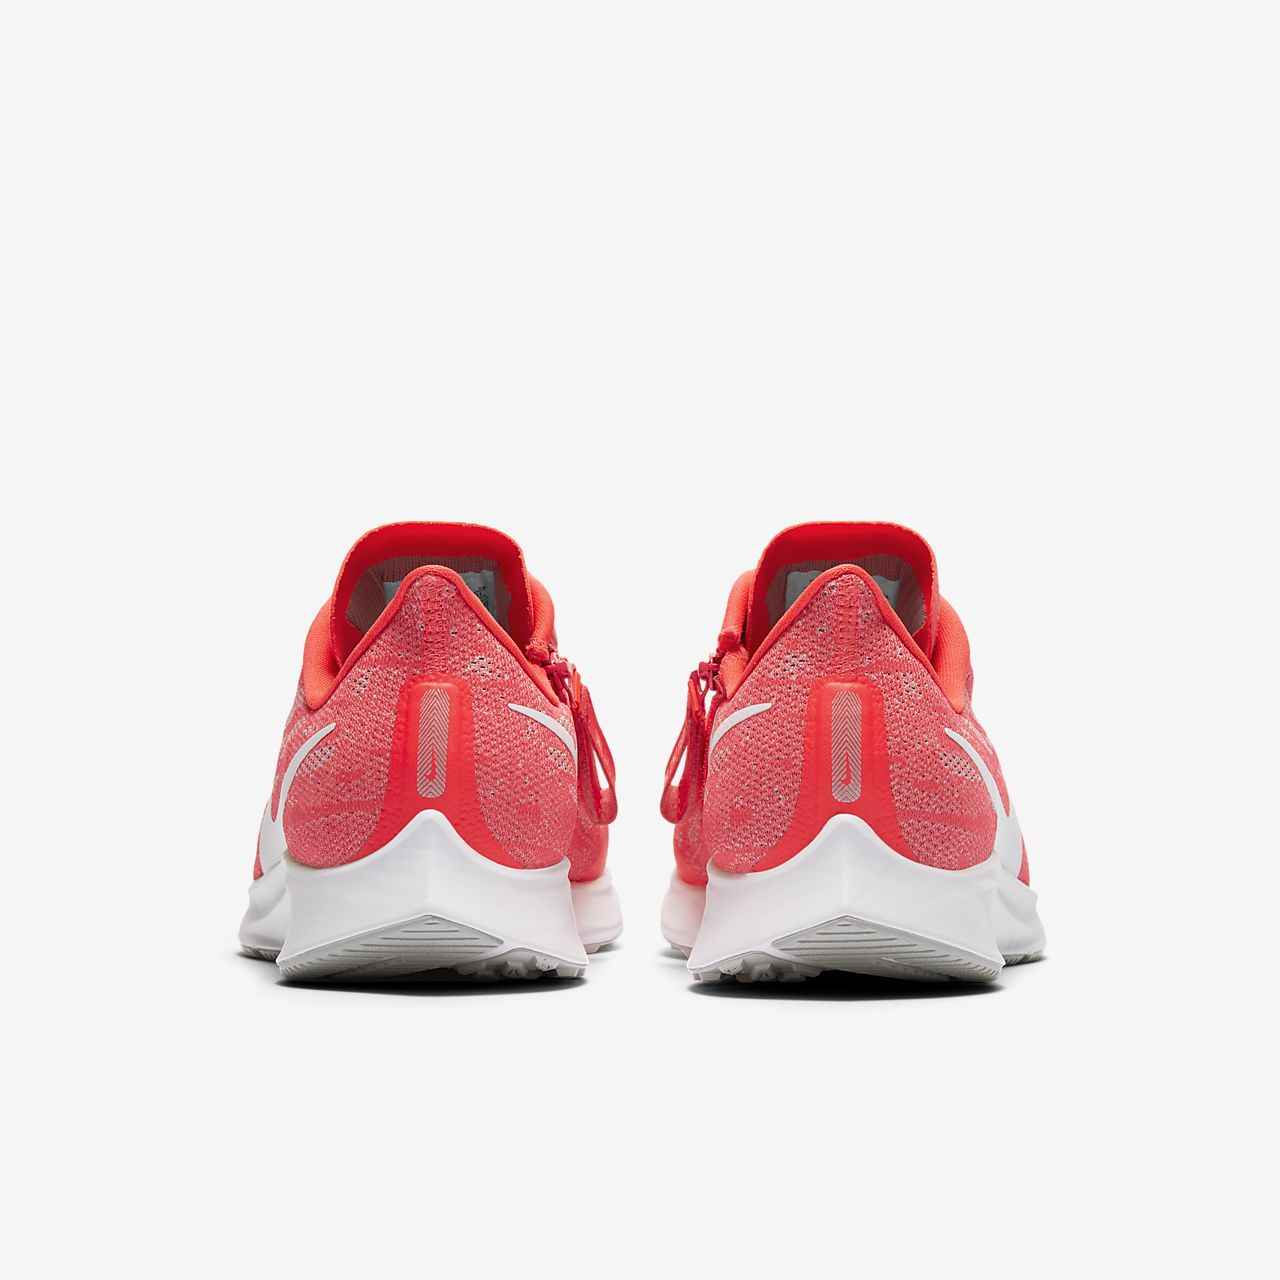 Giacca da donna Nike Impossible Light Bianco | Alltricks.it